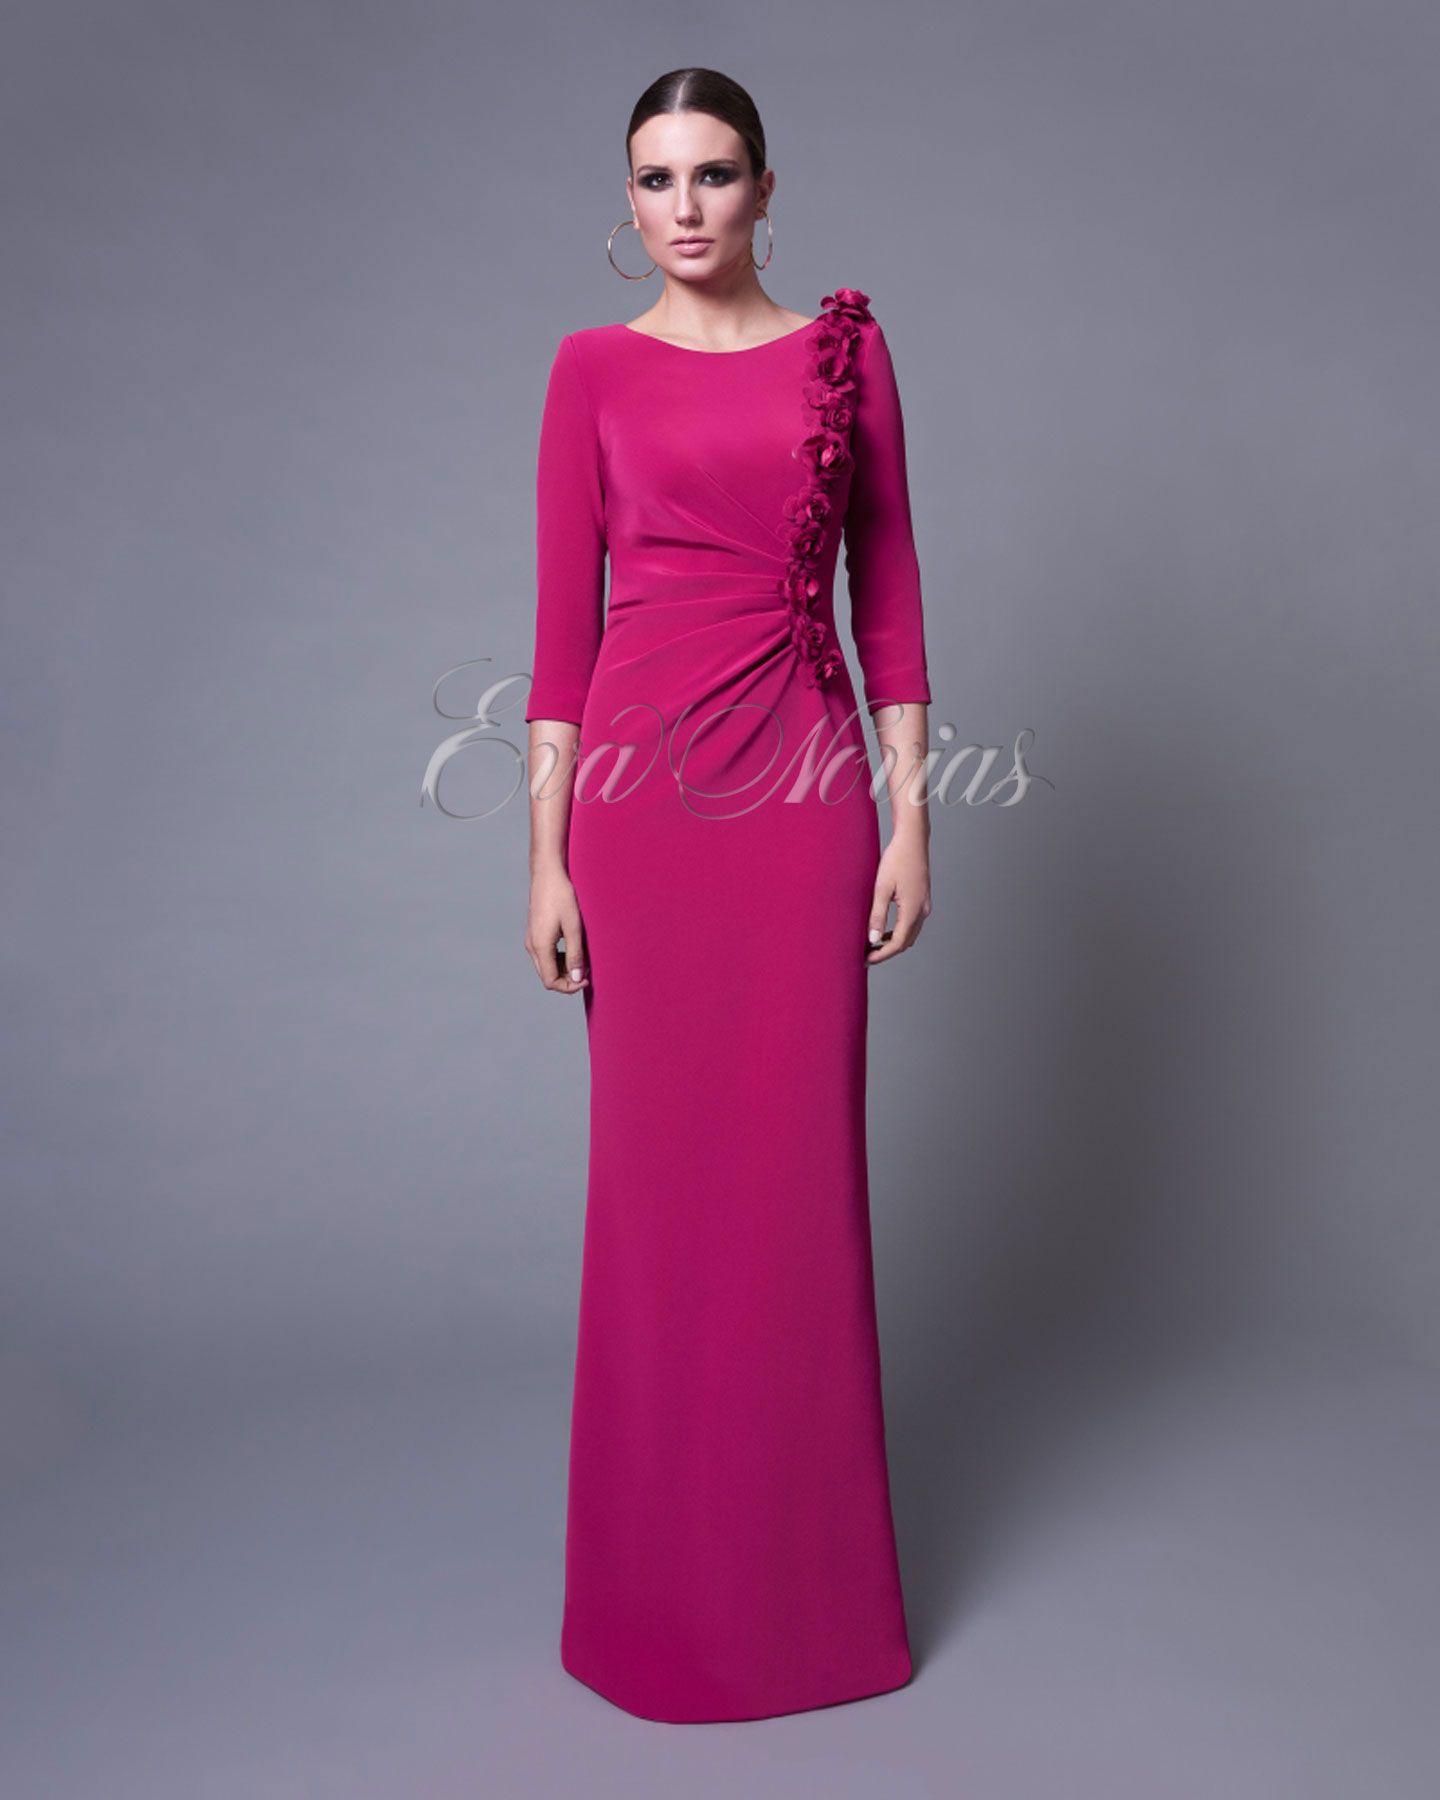 Vestido de fiesta Vicky Martin Berrocal modelo | Boda | Pinterest ...